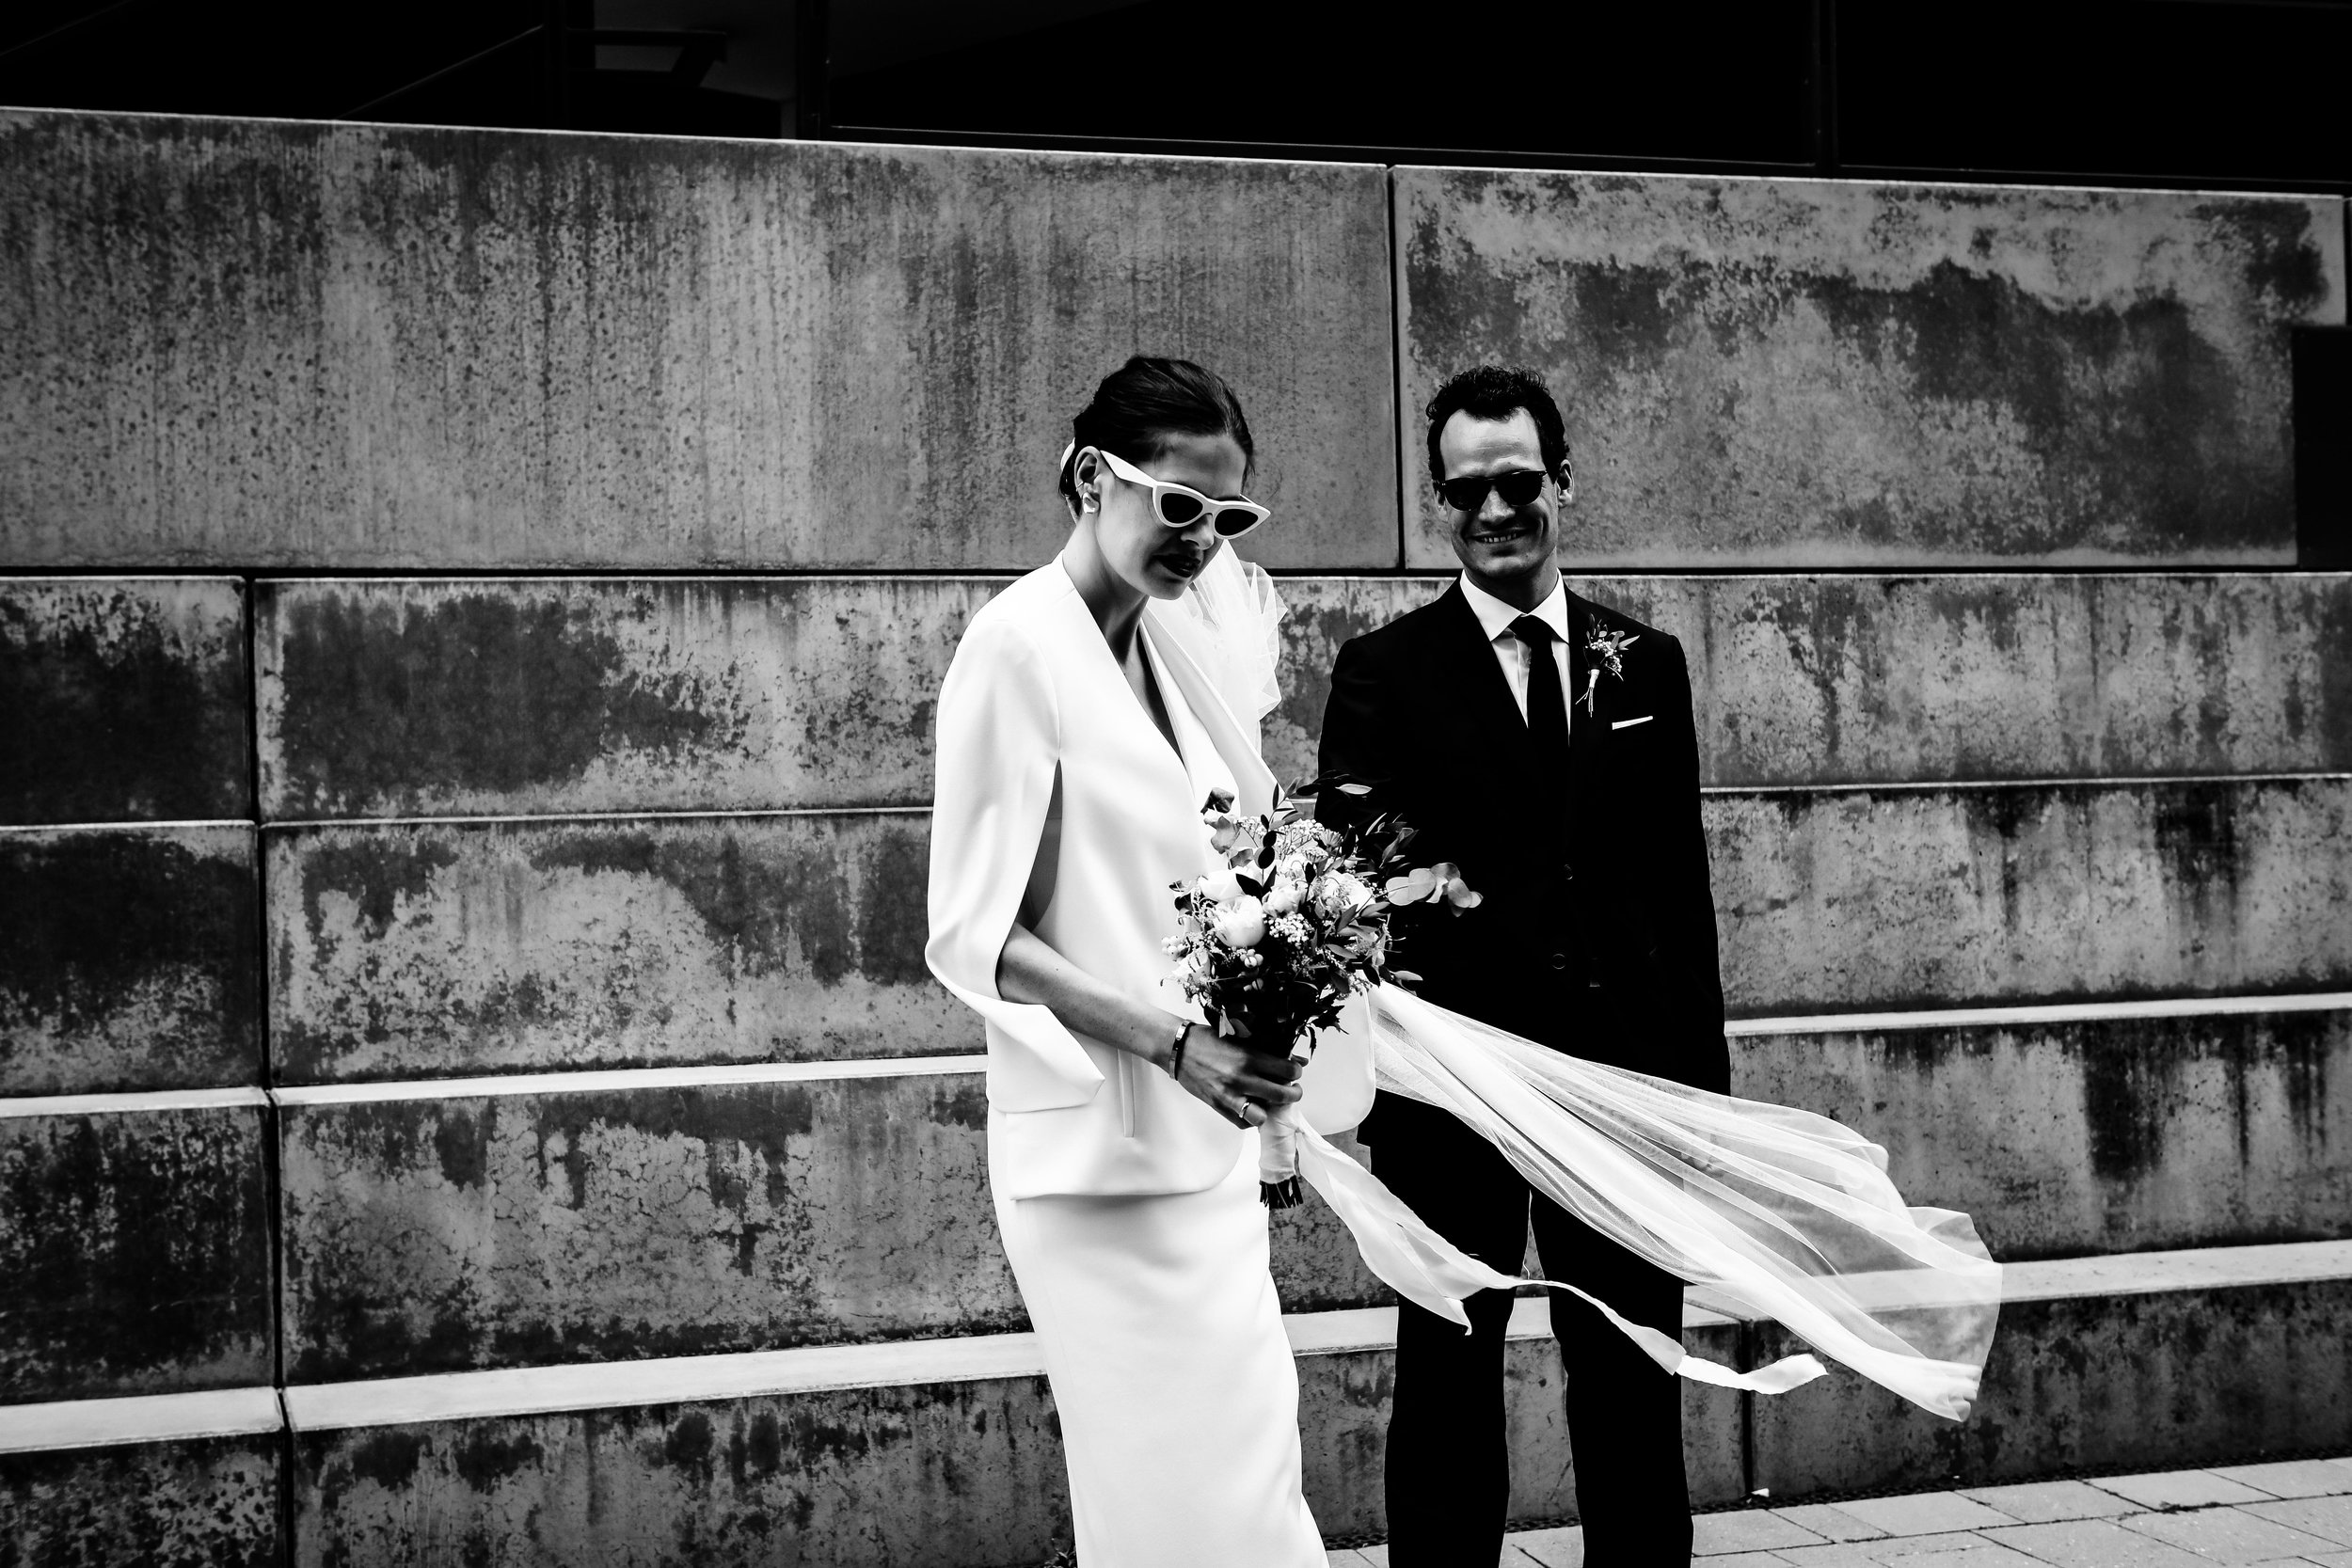 Mela & Arno - Getting Ready im SIR Nikolai / HamburgDress by Solace LondonSunglasses & Shoes by CELINE